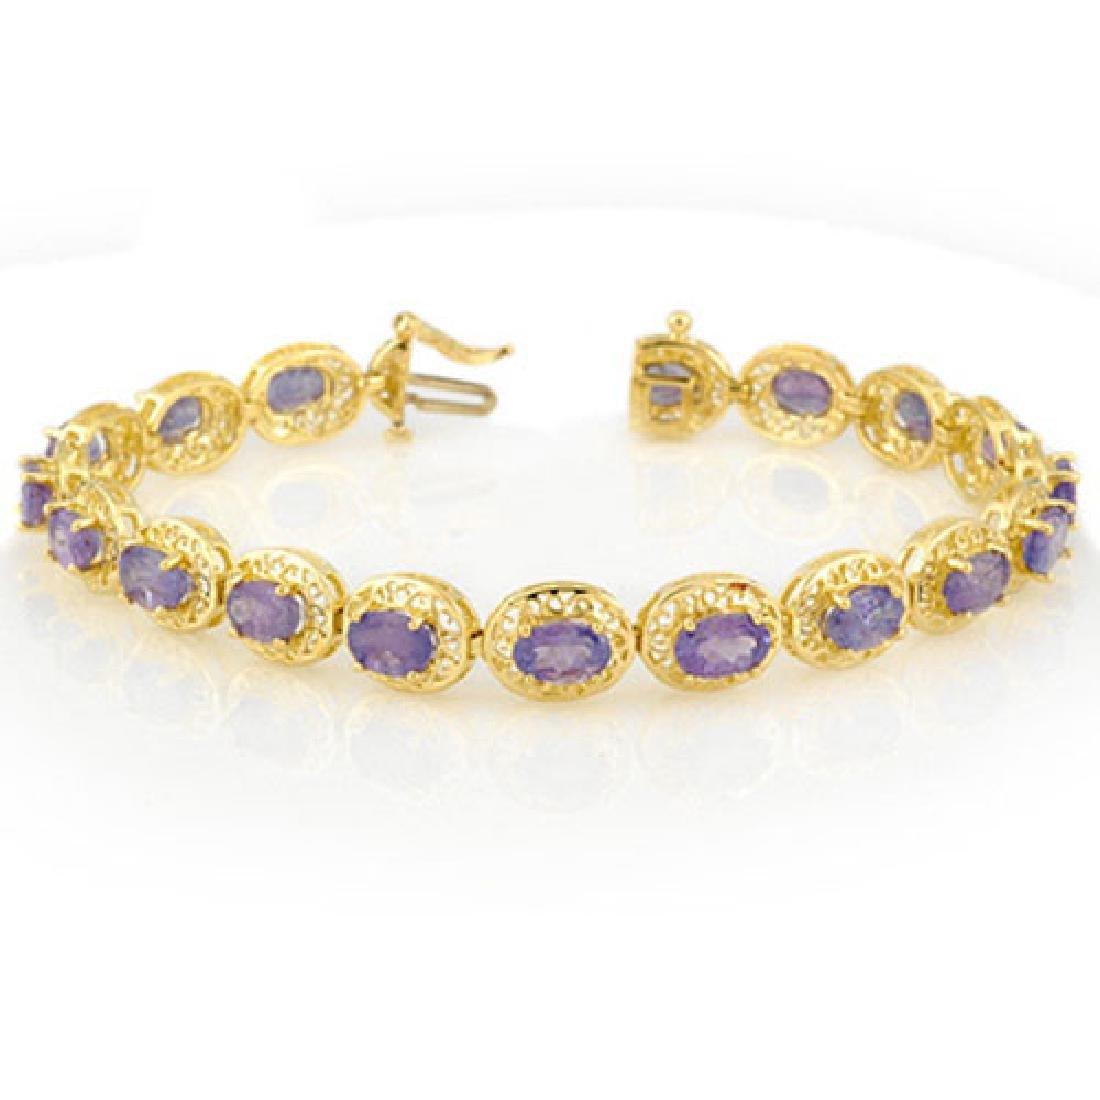 18.0 CTW Tanzanite Bracelet 10K Yellow Gold